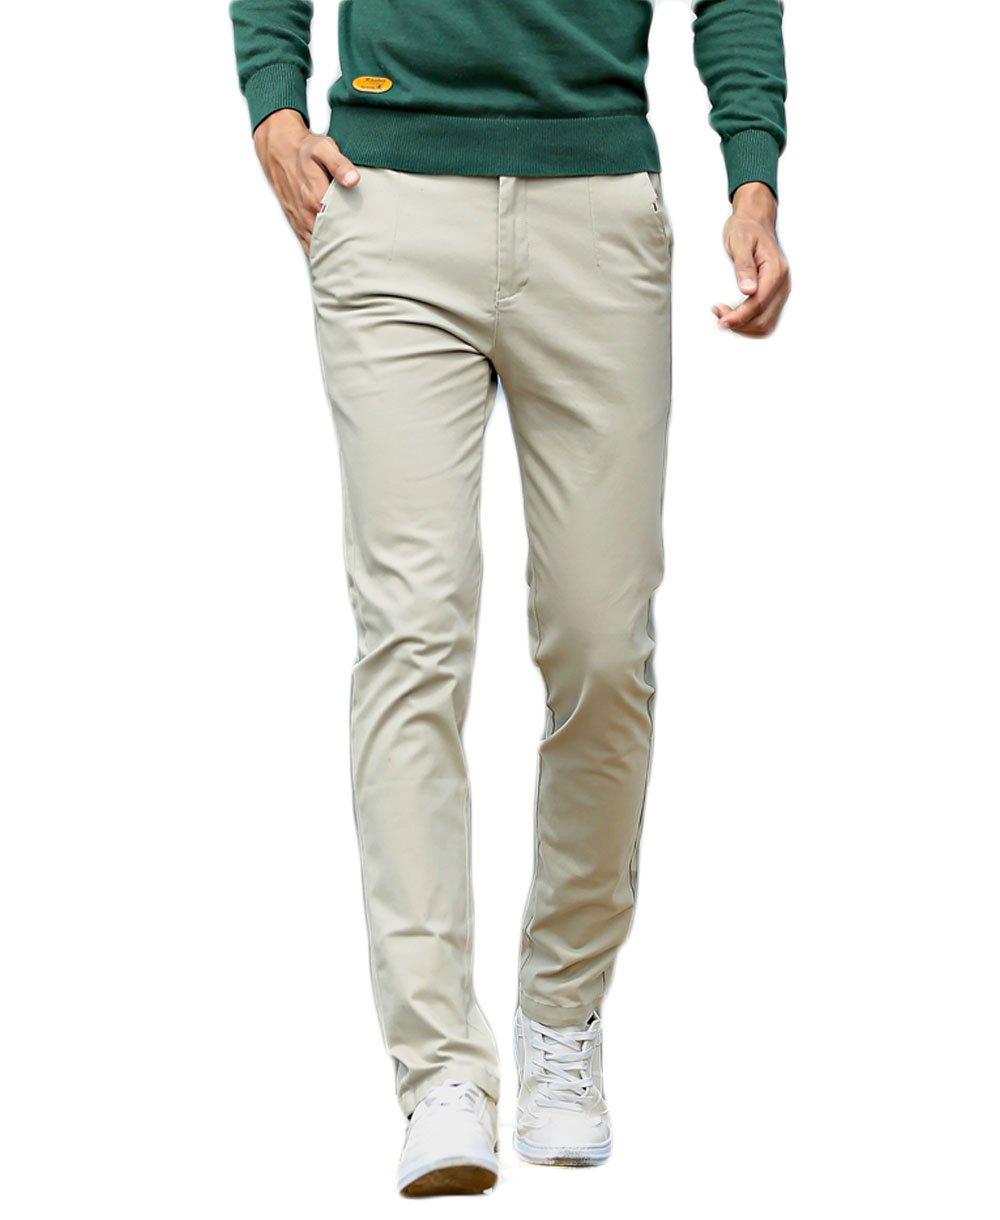 OLUOLIN Men's Modern Slim-Fit Stretch Chino Kaqi Pant Size 30